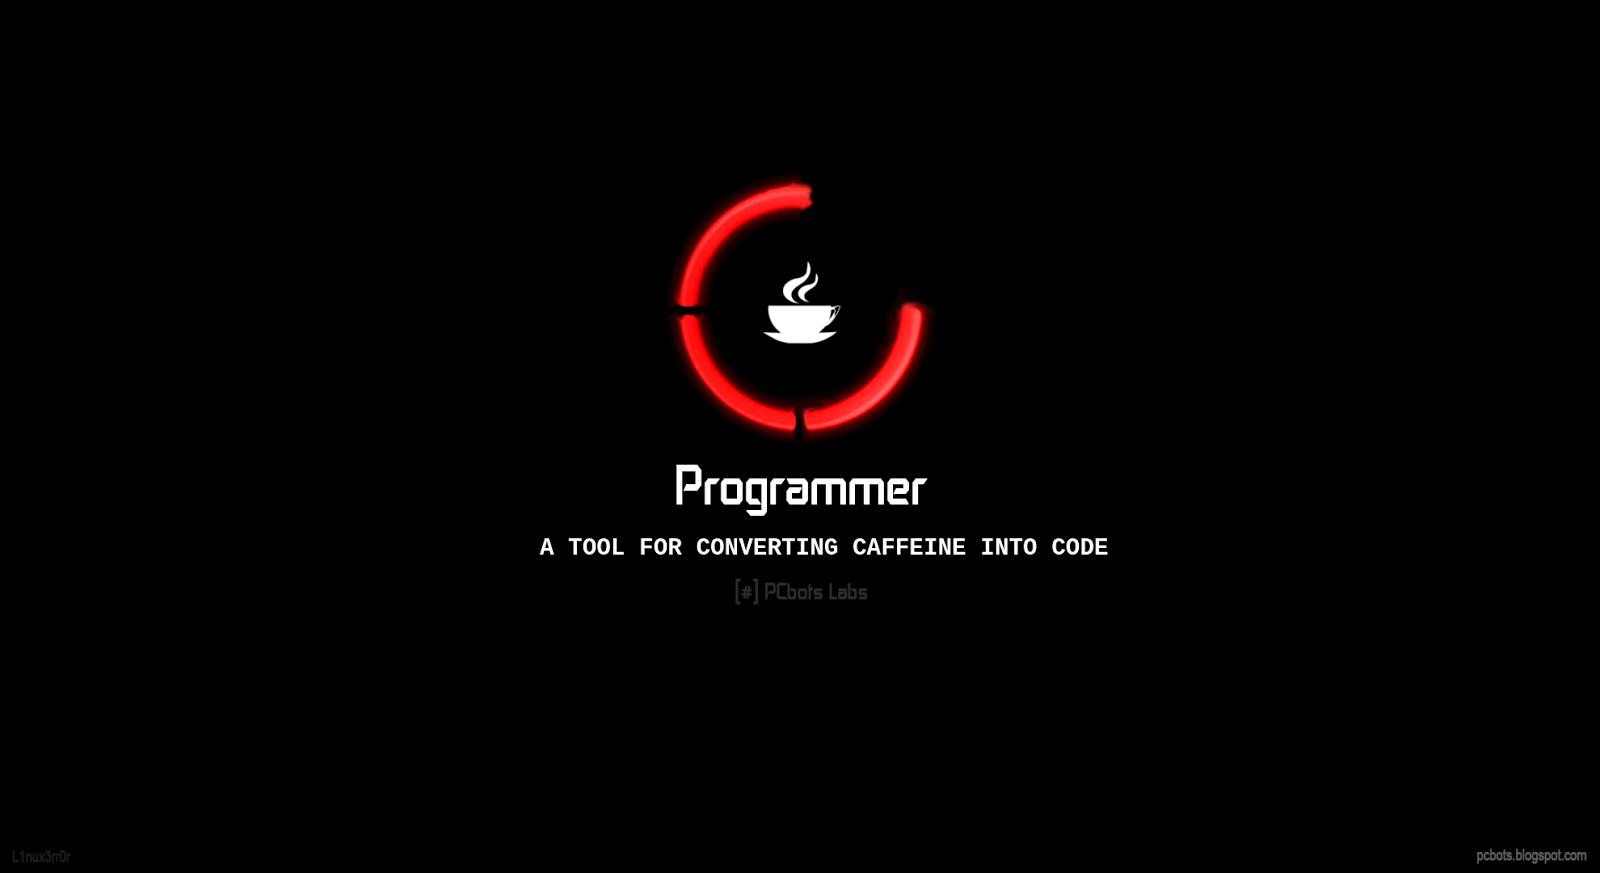 Programming Wallpaper Programmer hd 1600x873